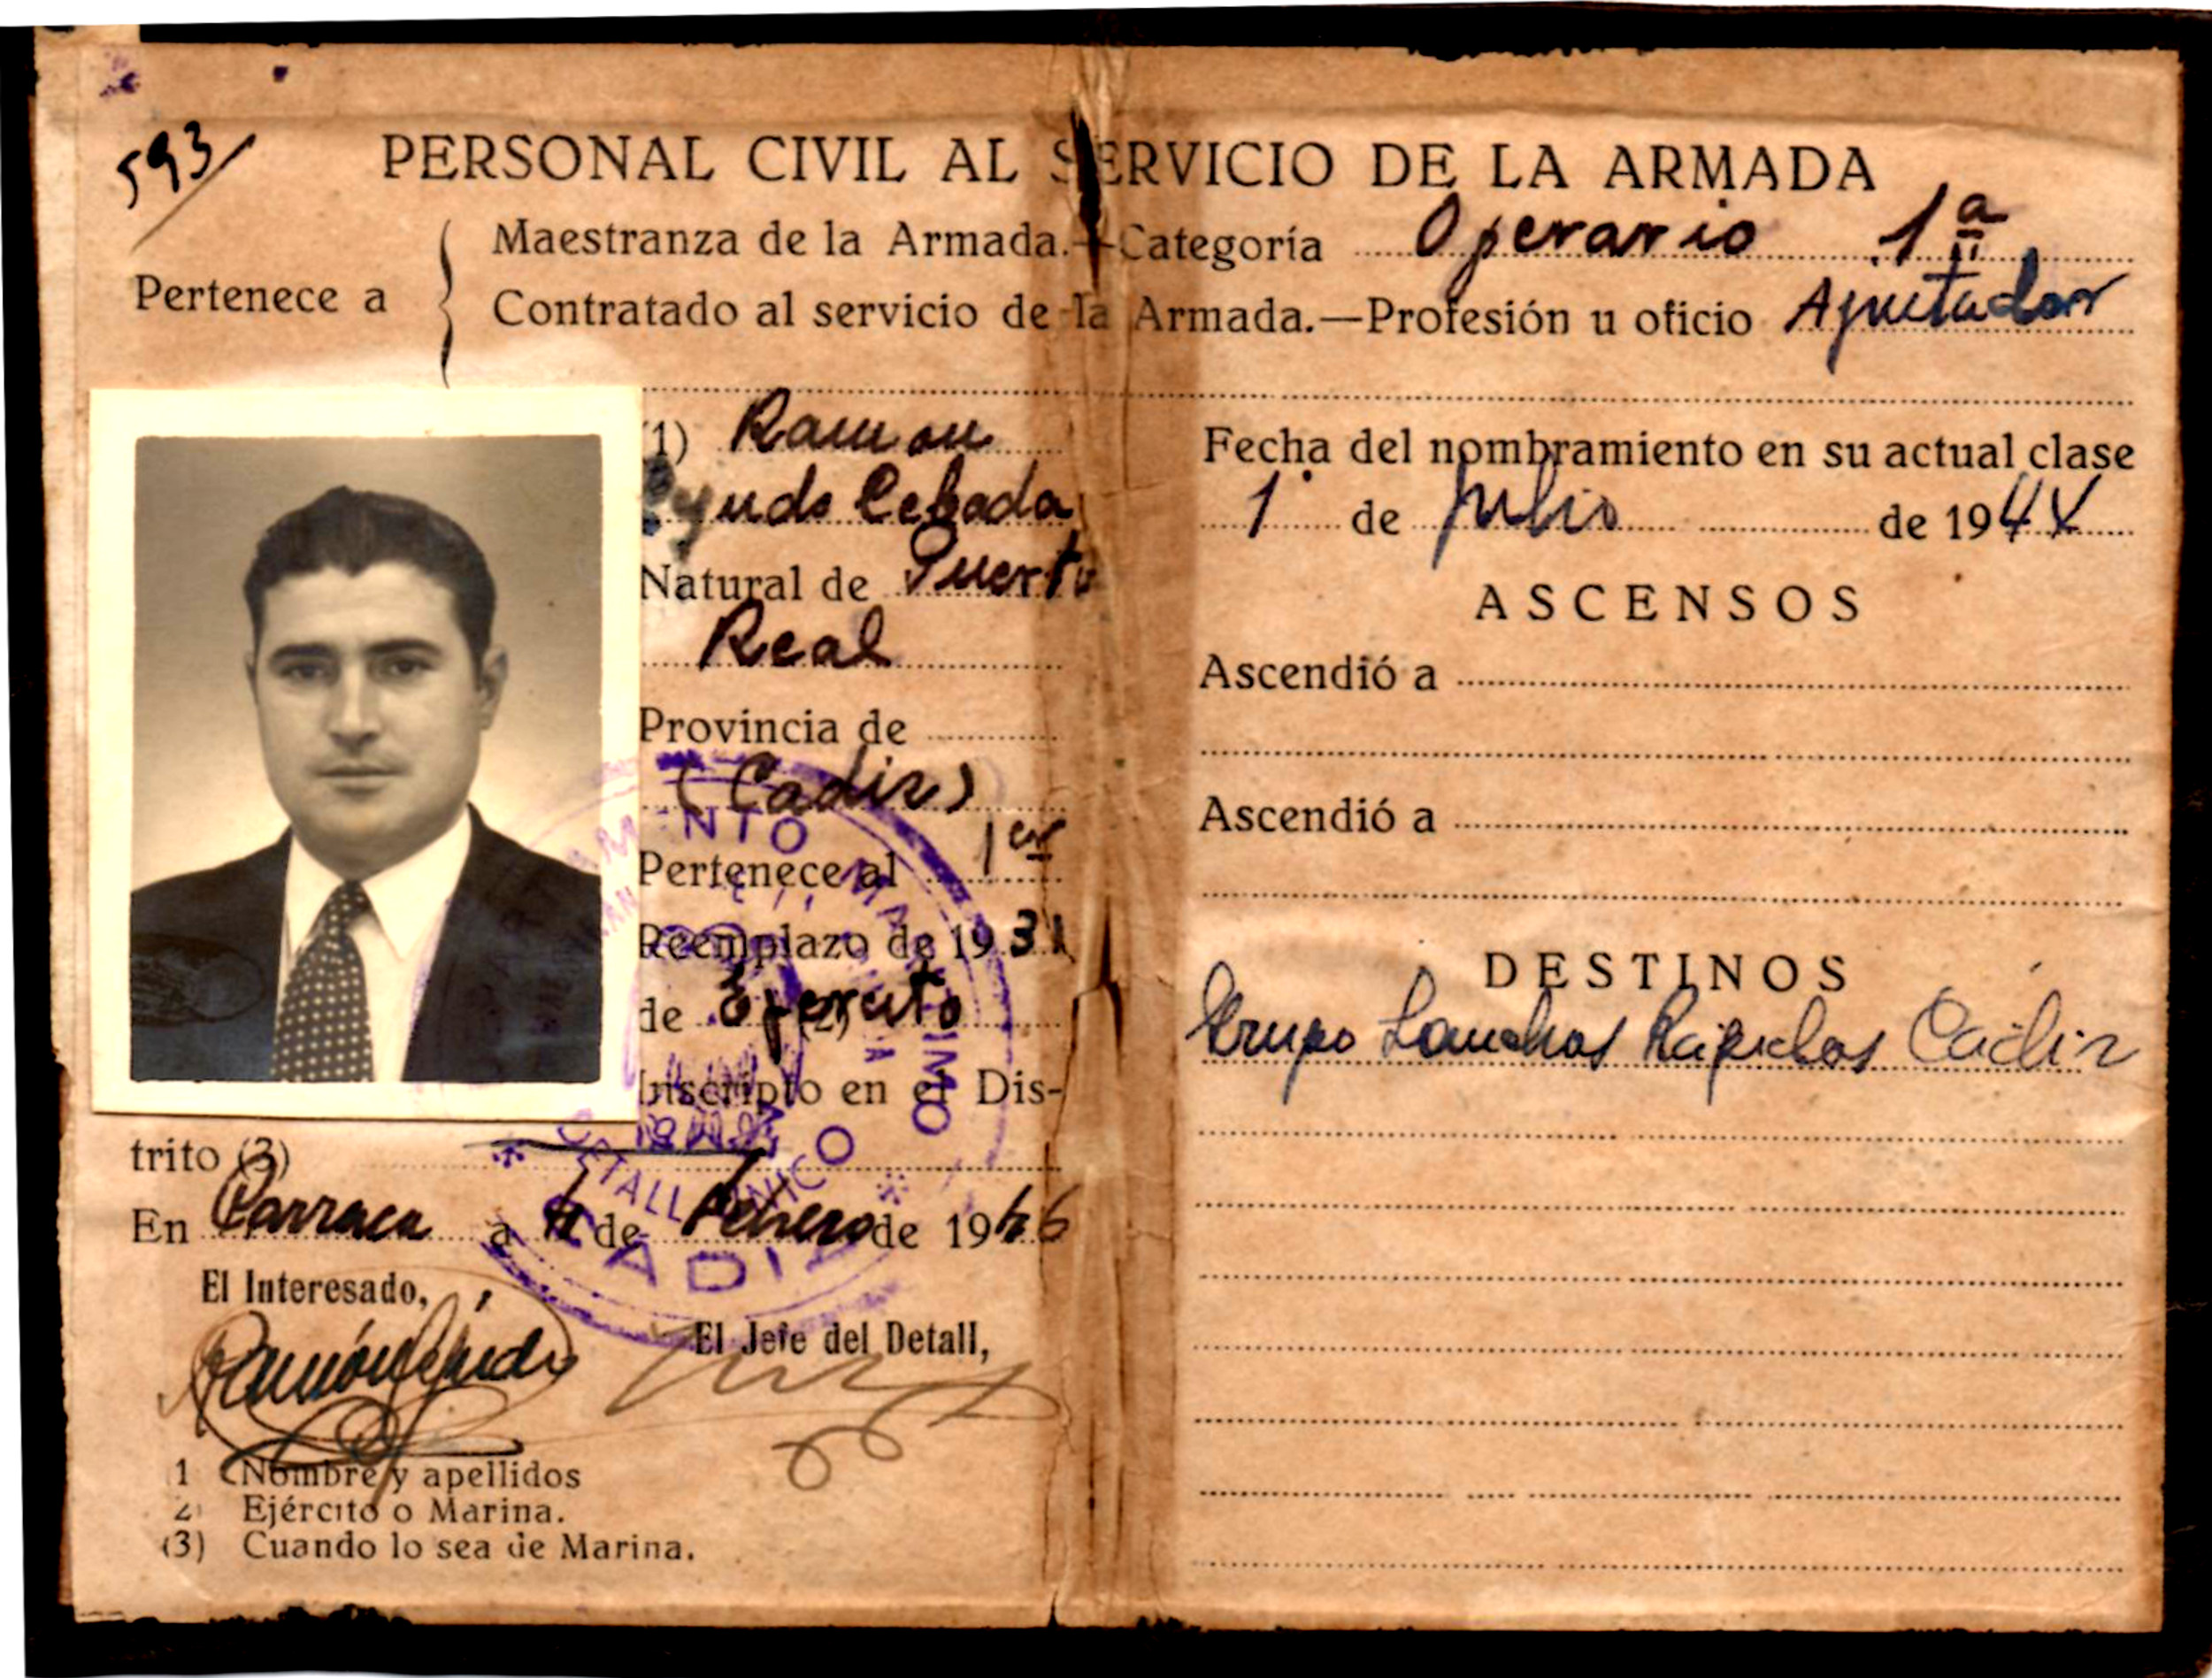 Carnet de la Maestranza de Ramón Cejudo Cebada